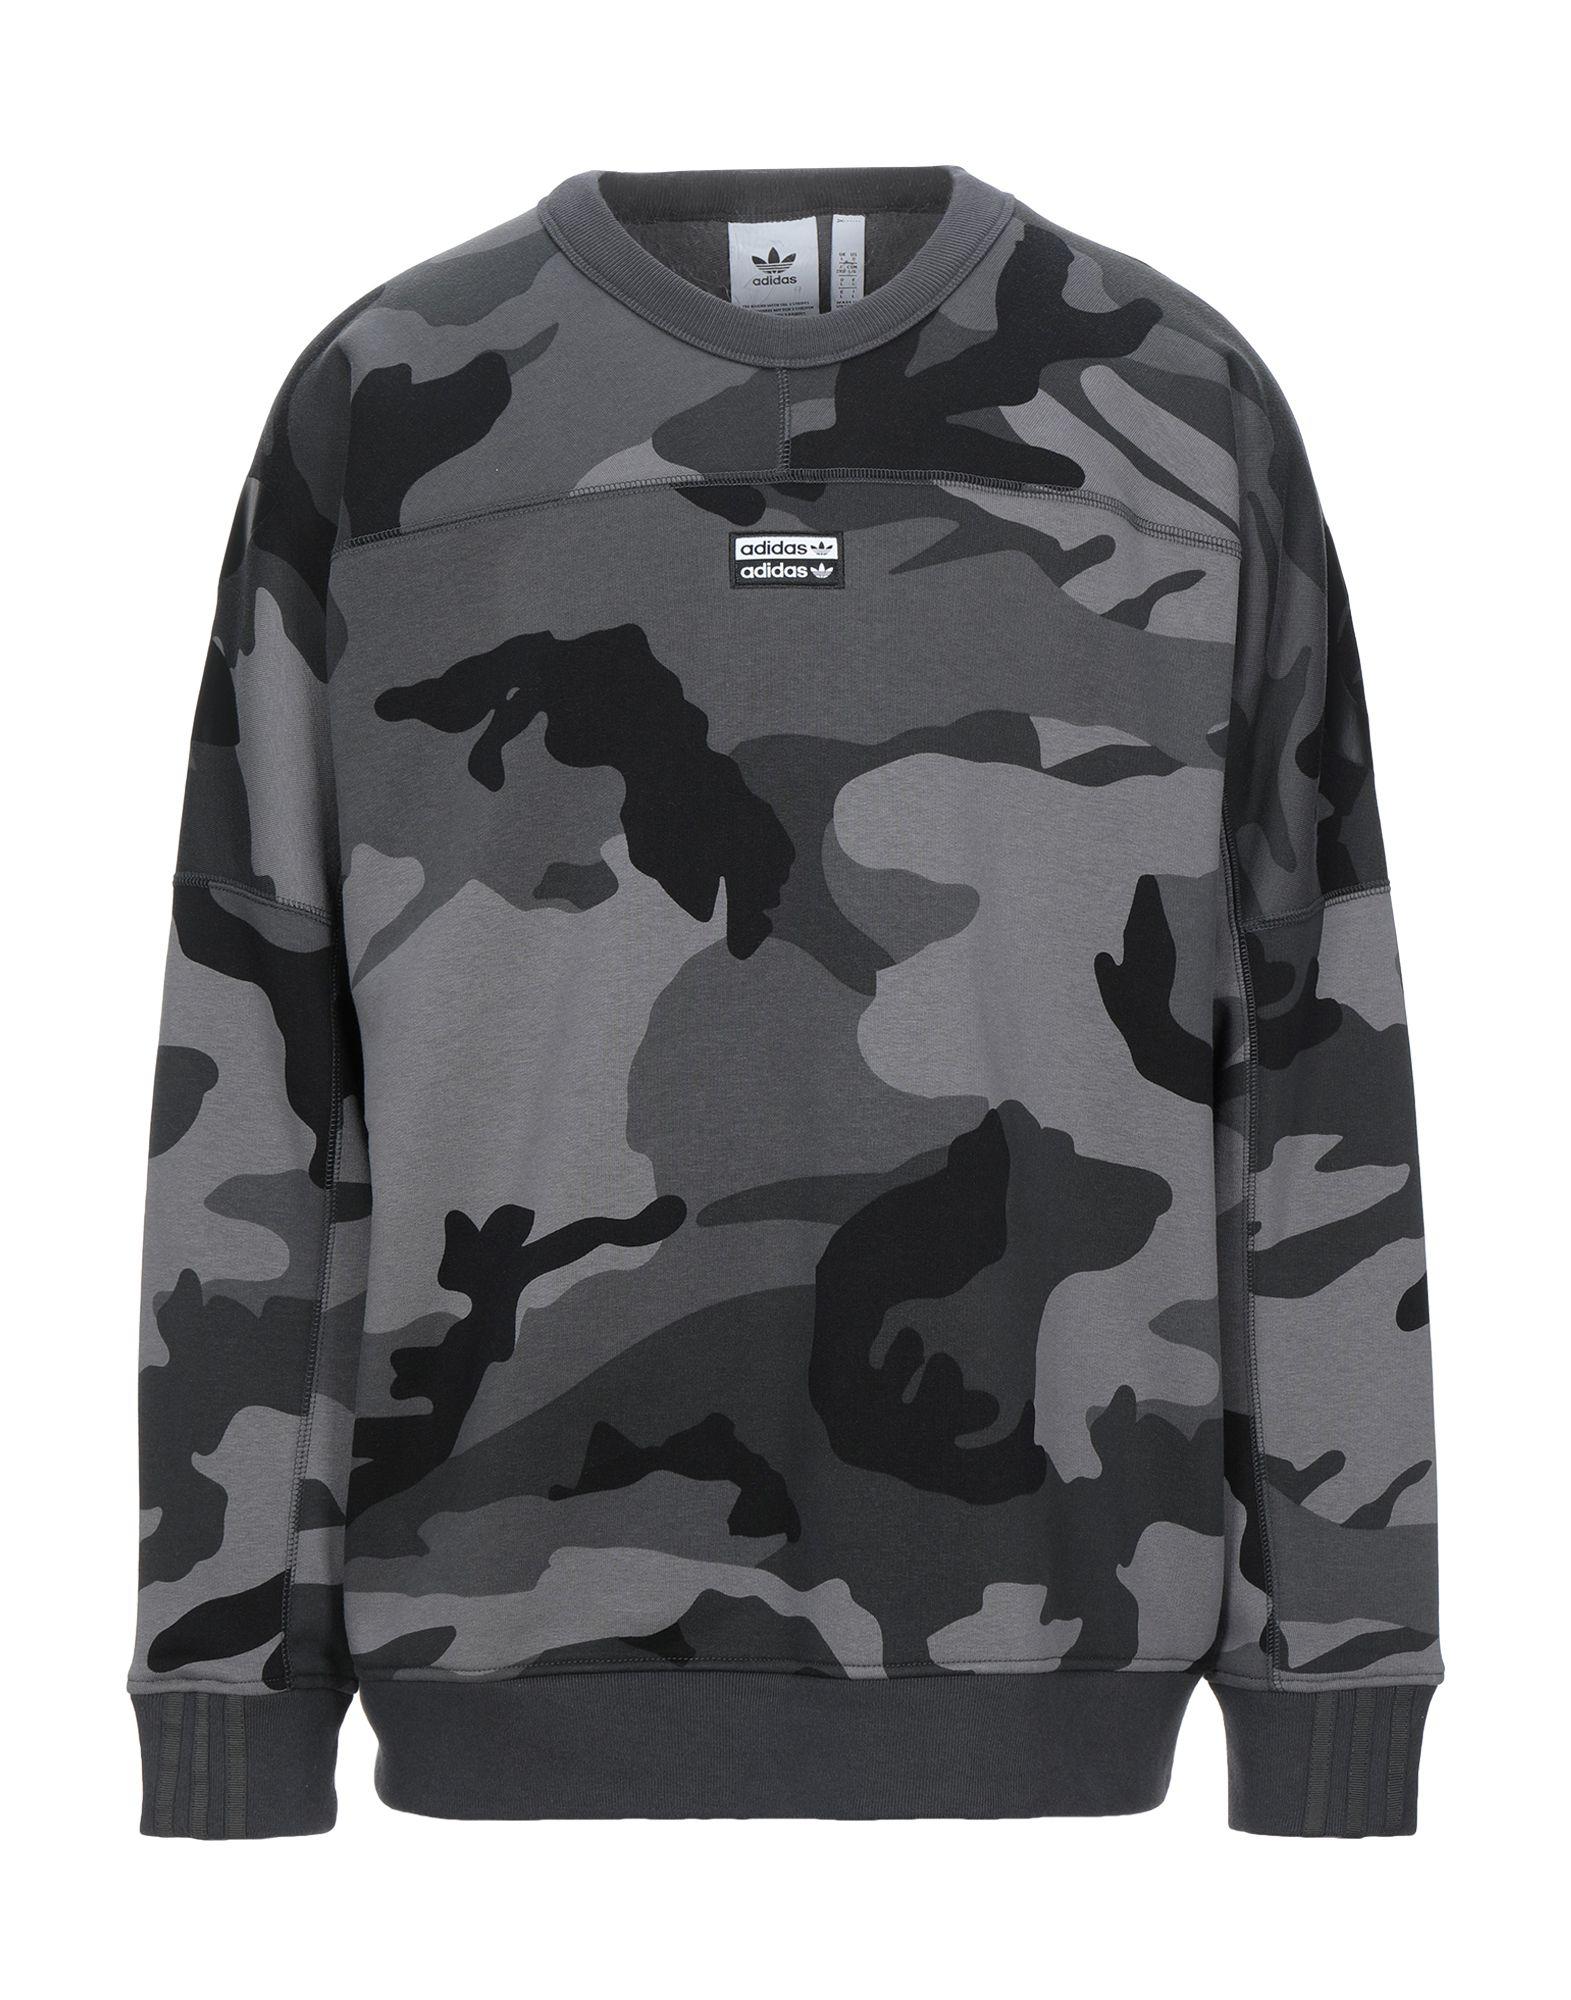 sweatshirt fleece, contrasting applications, logo, camouflage, round collar, long sleeves, no pocket